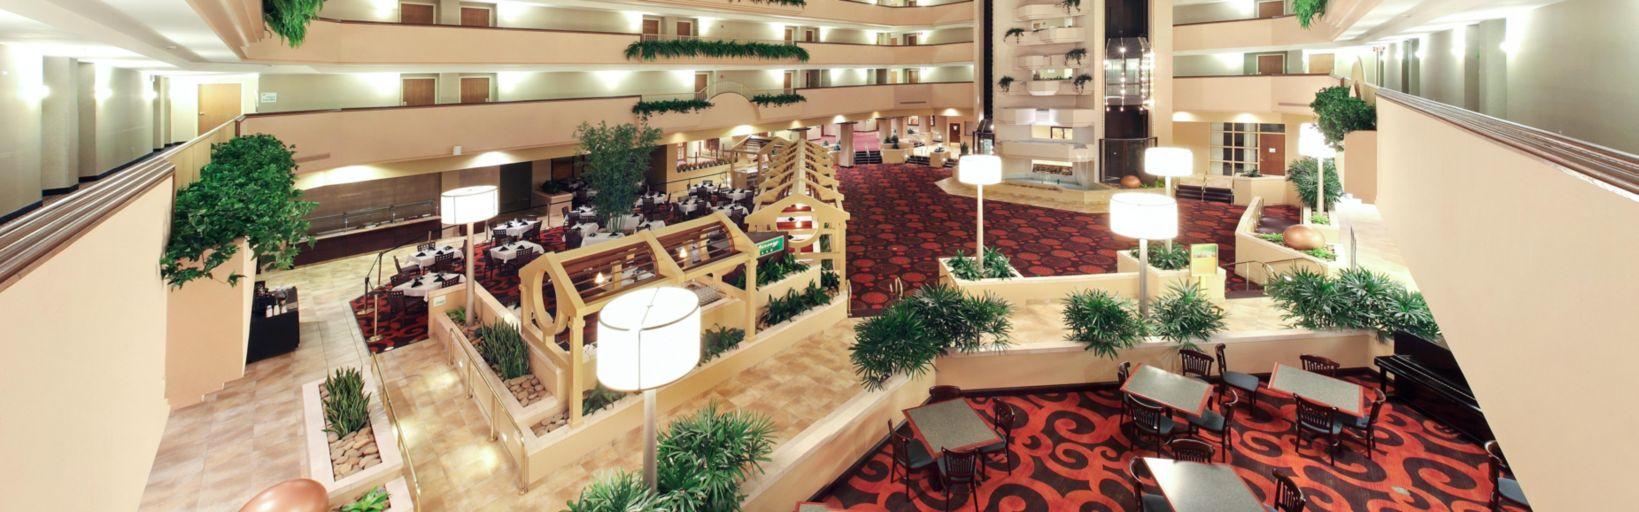 Holiday Inn Springdale/Fayetteville Area Hotel by IHG